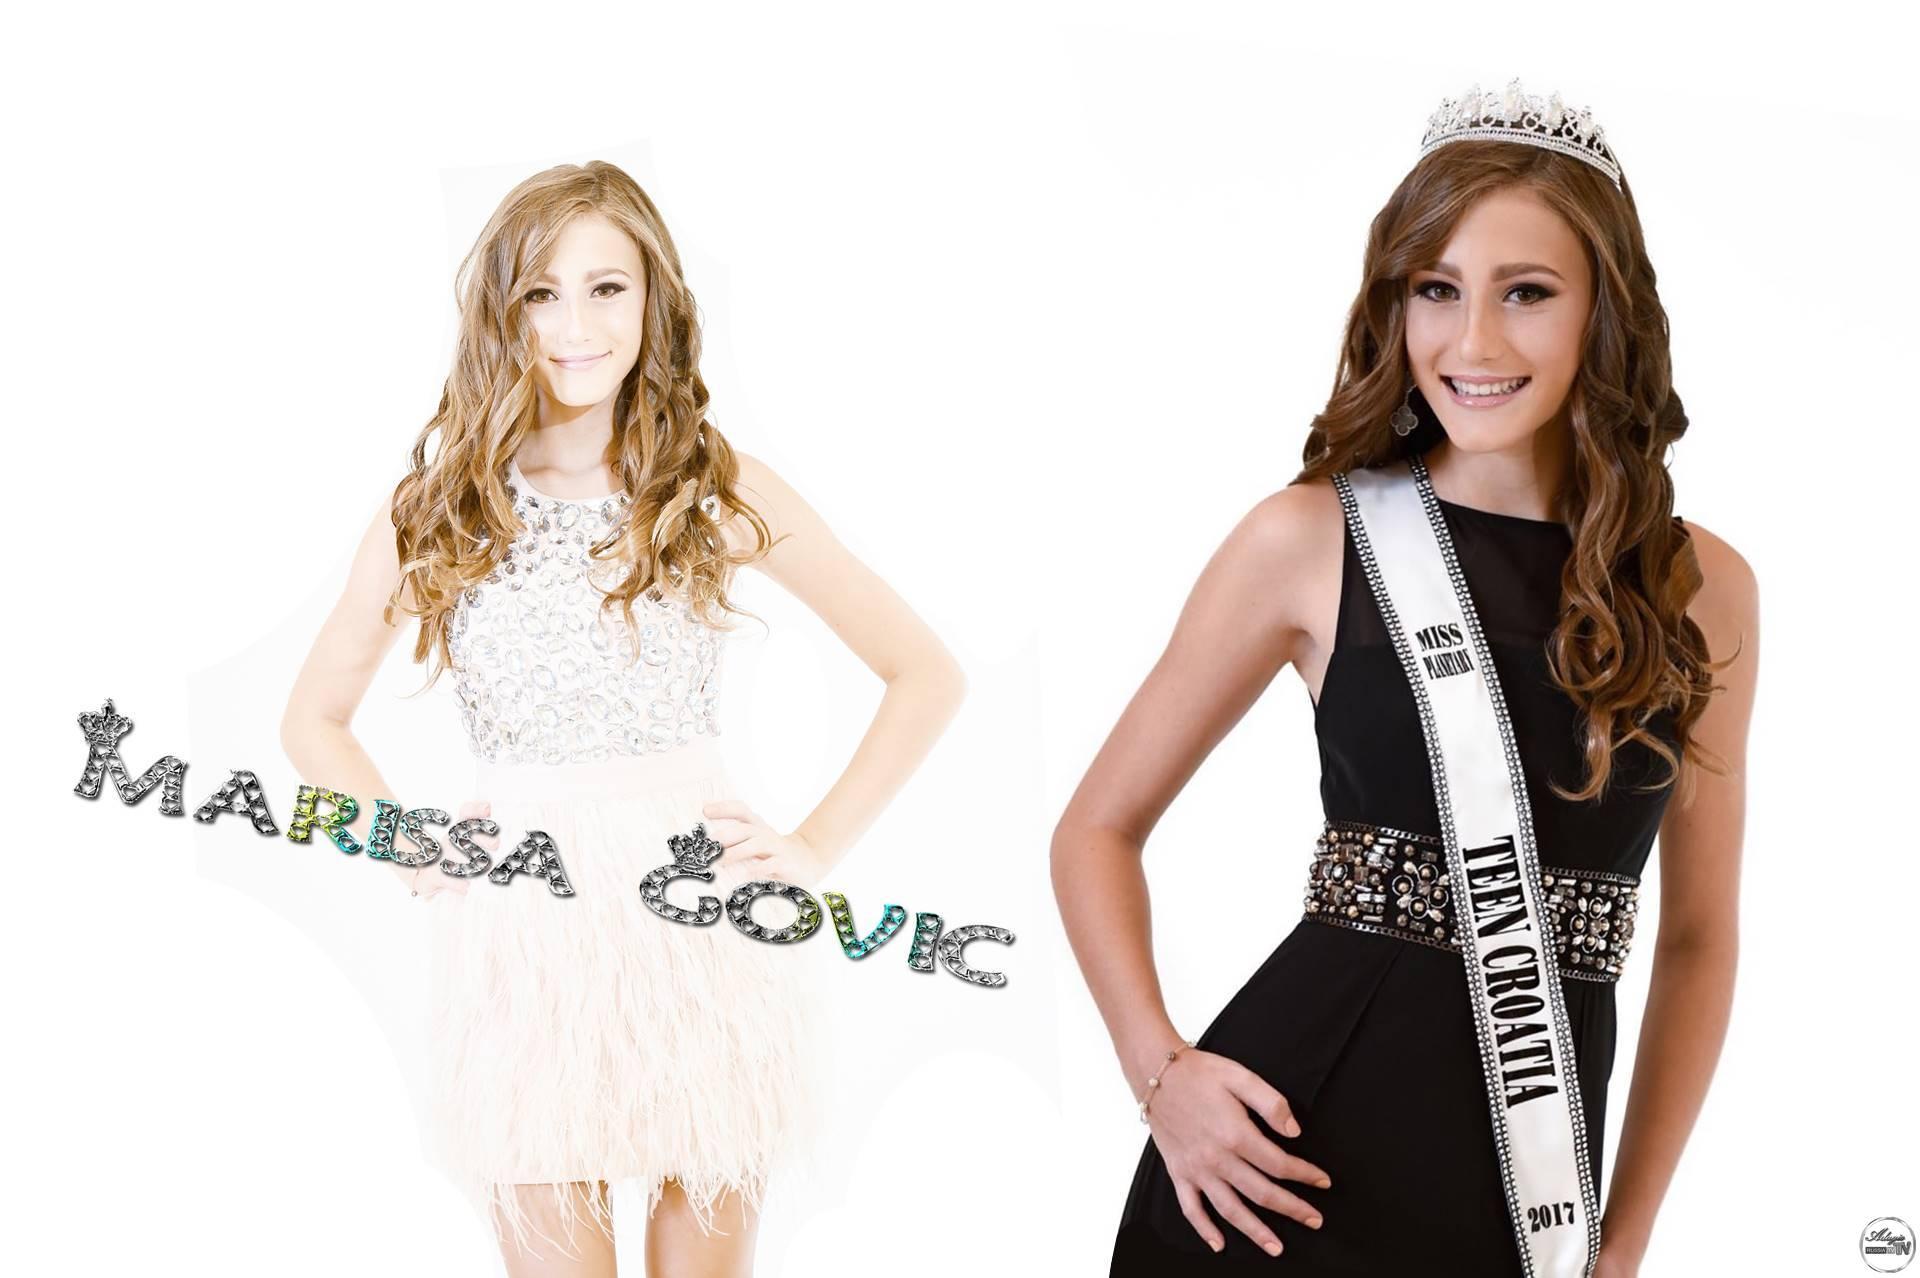 Marissa Govic